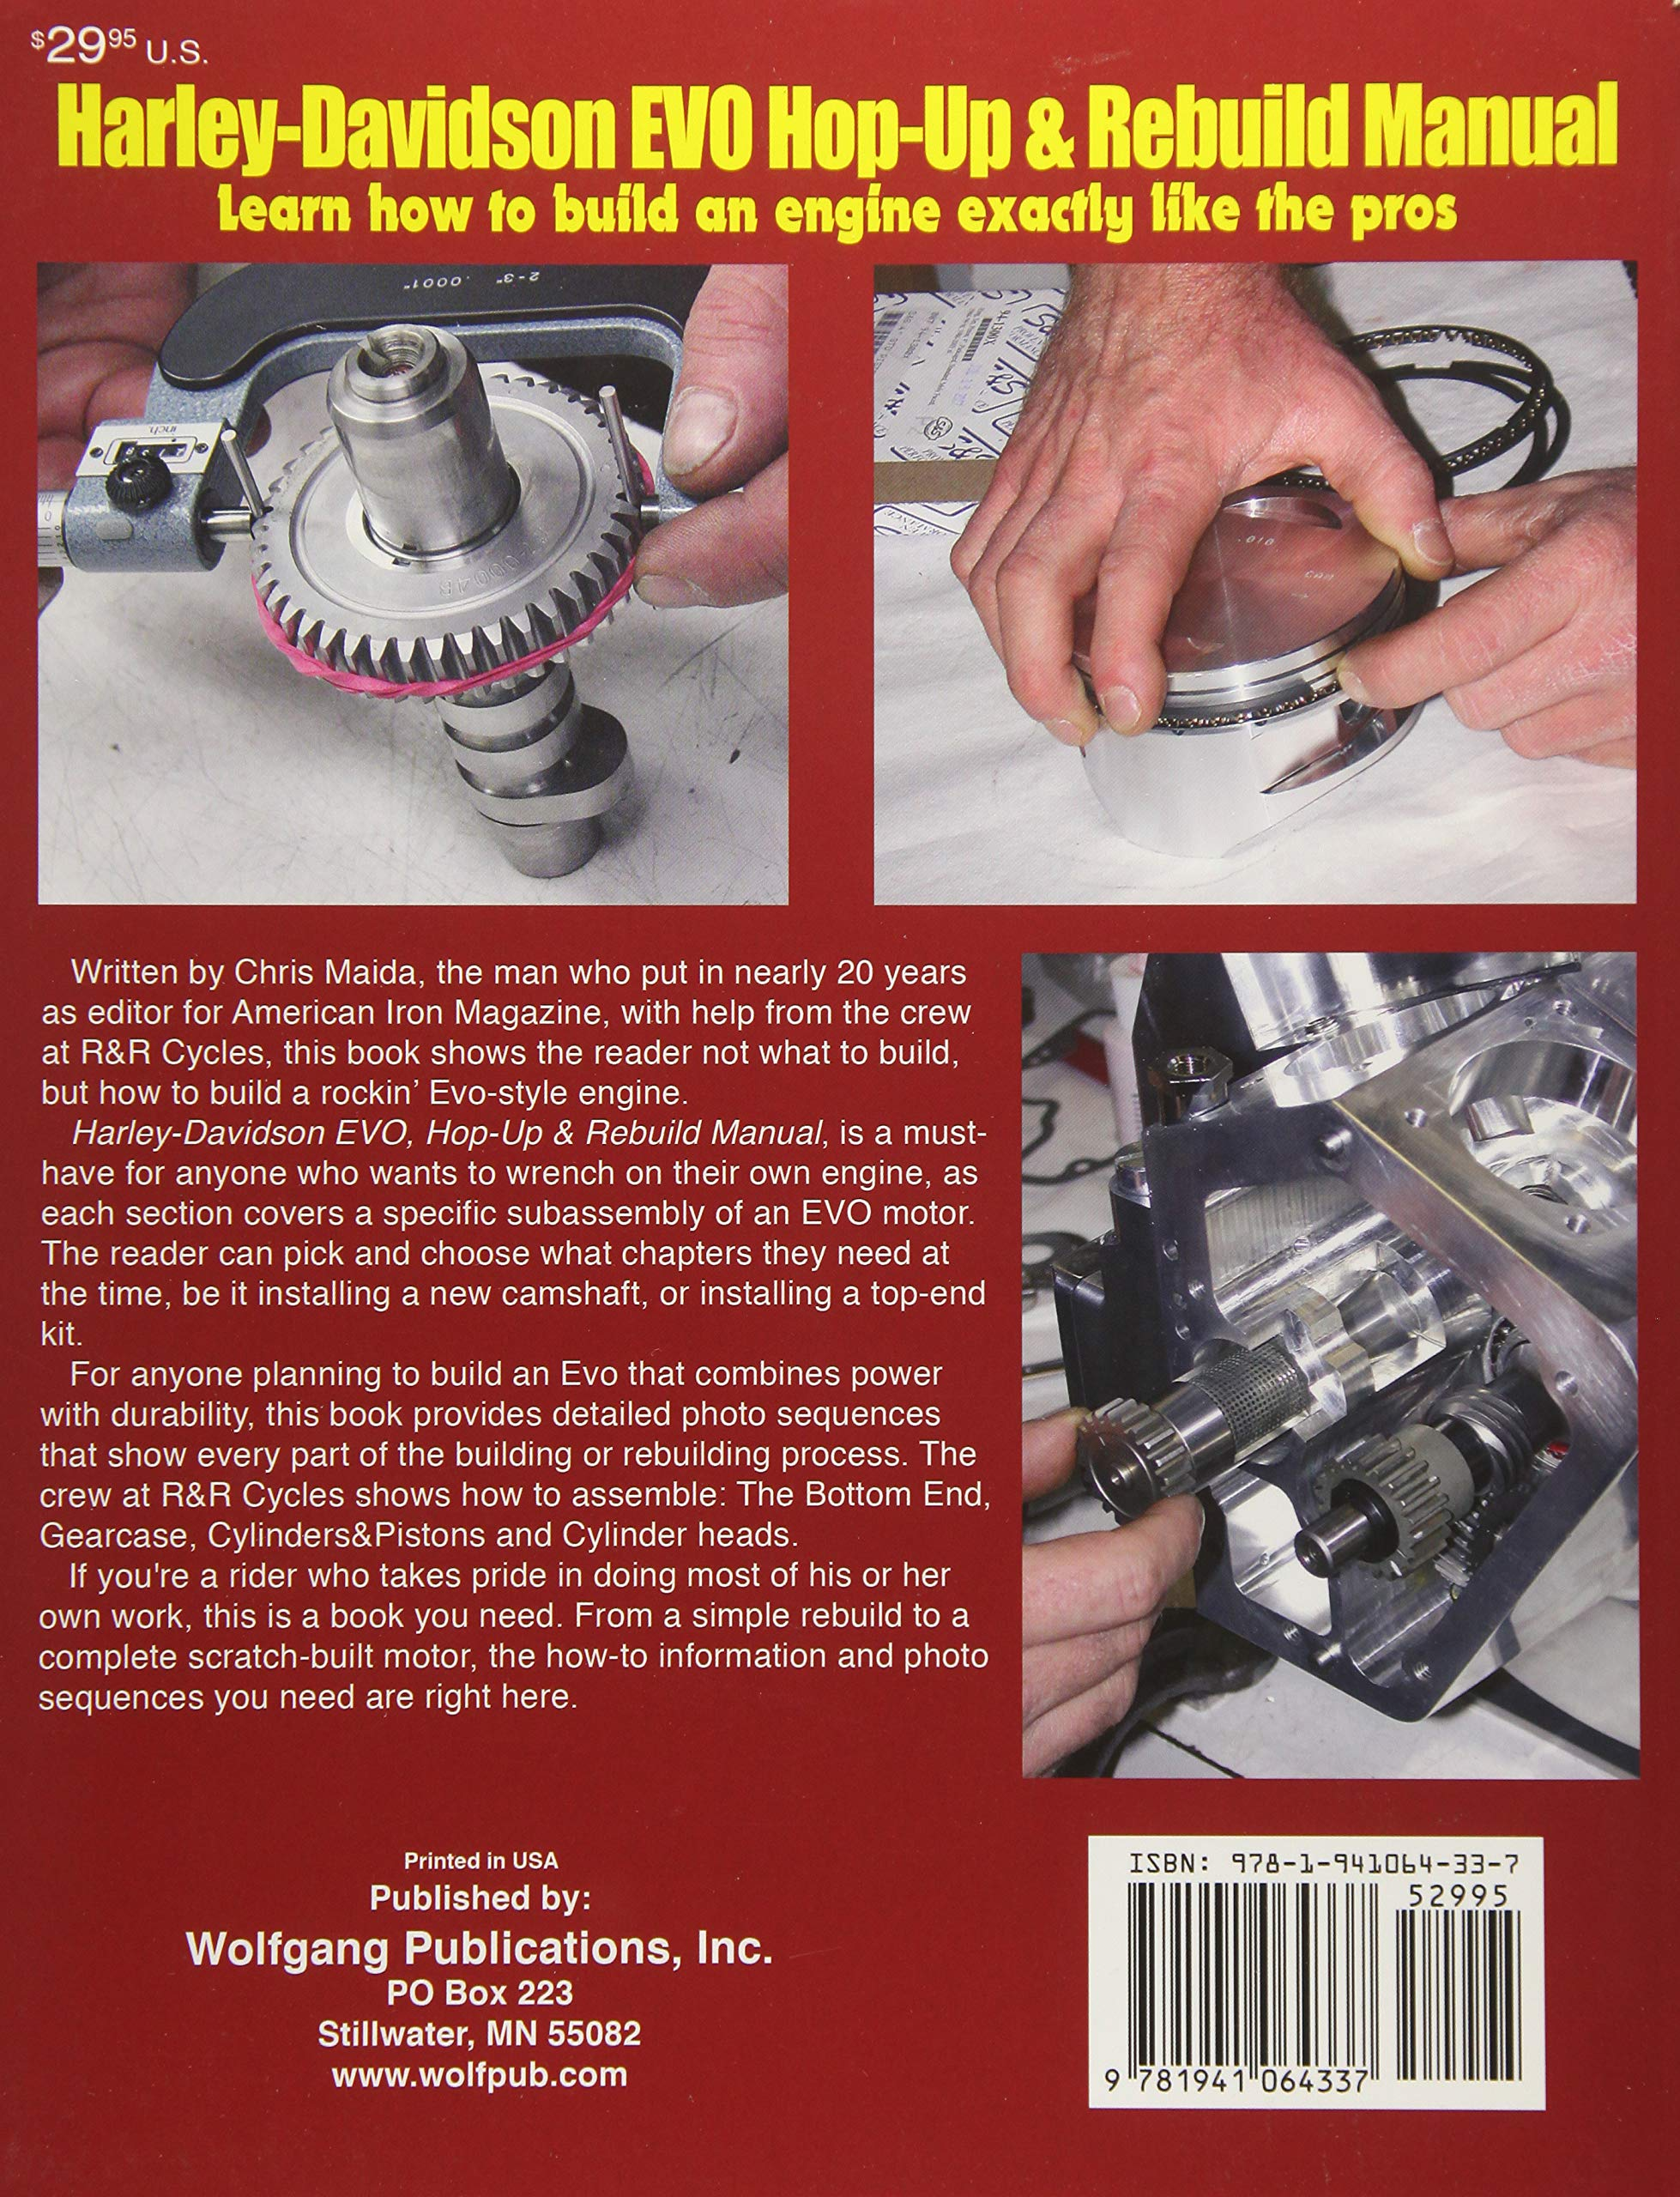 Harley-Davidson EVO: Hop-Up & Rebuild Manual: Chris Maida: 9781941064337:  Amazon.com: Books